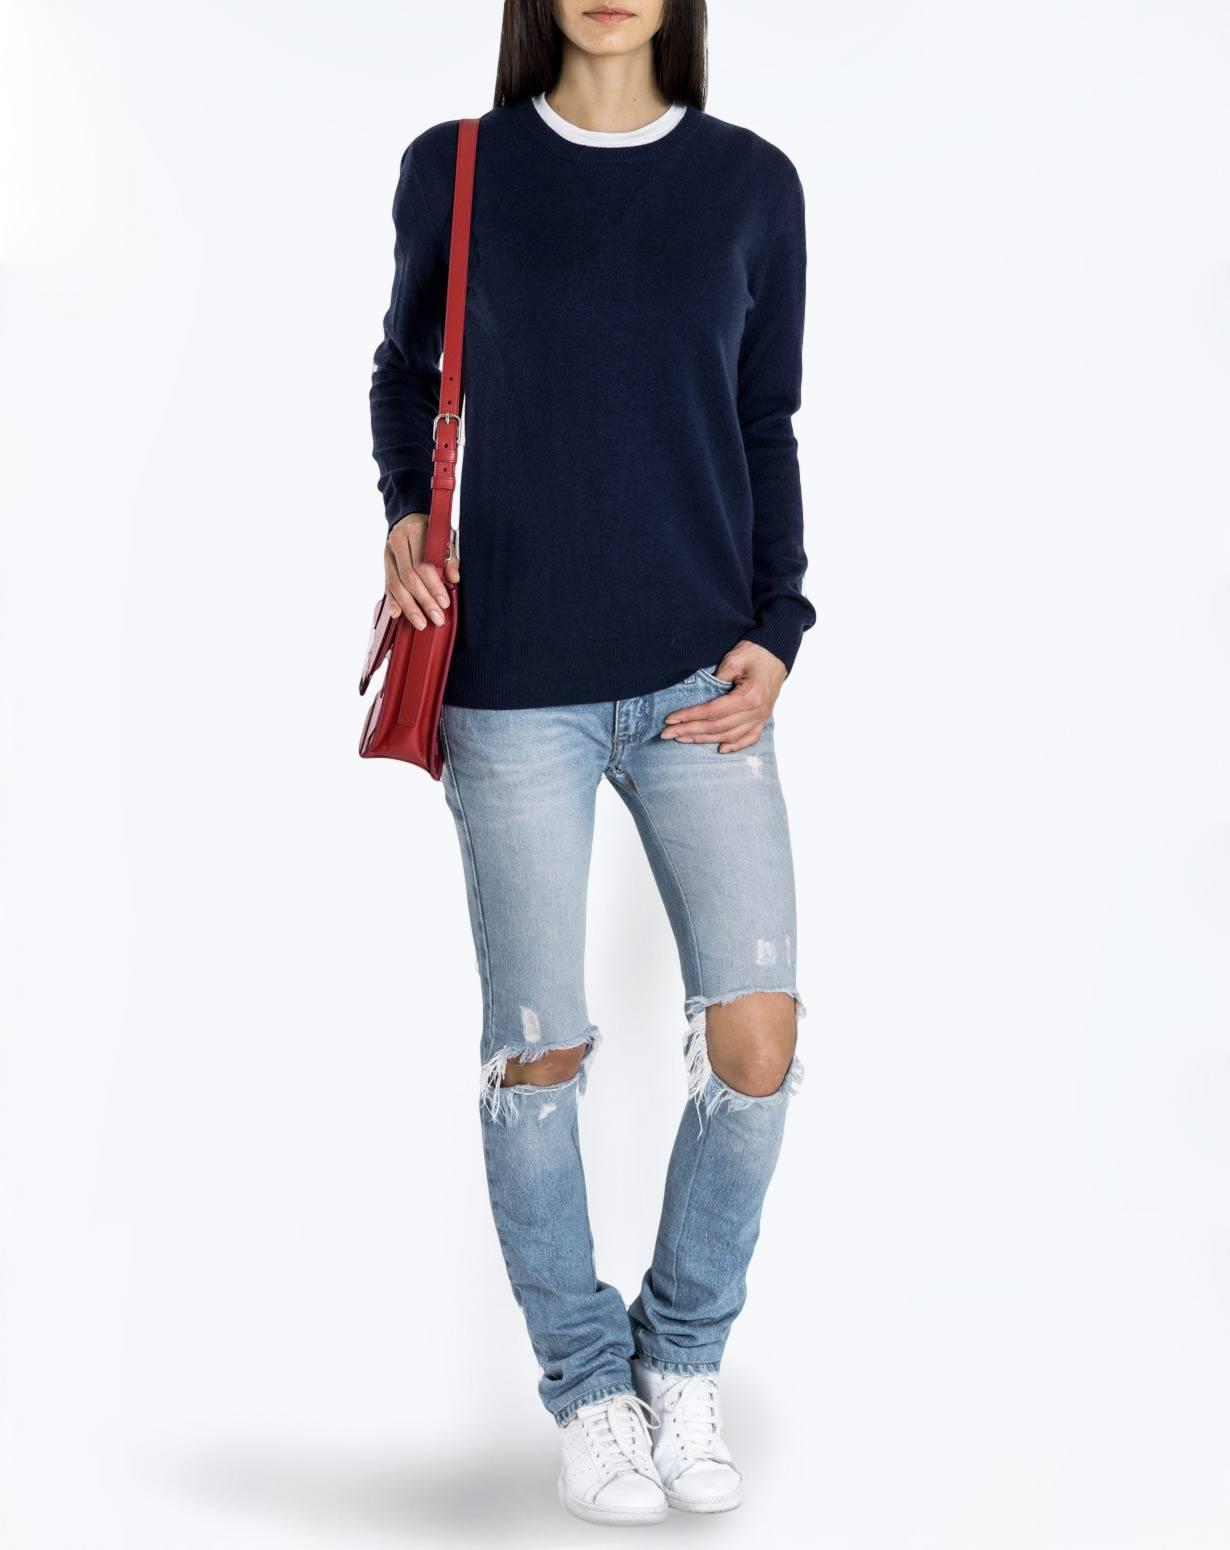 Cashmere Boyfriend Sweater | MaisonCashmere